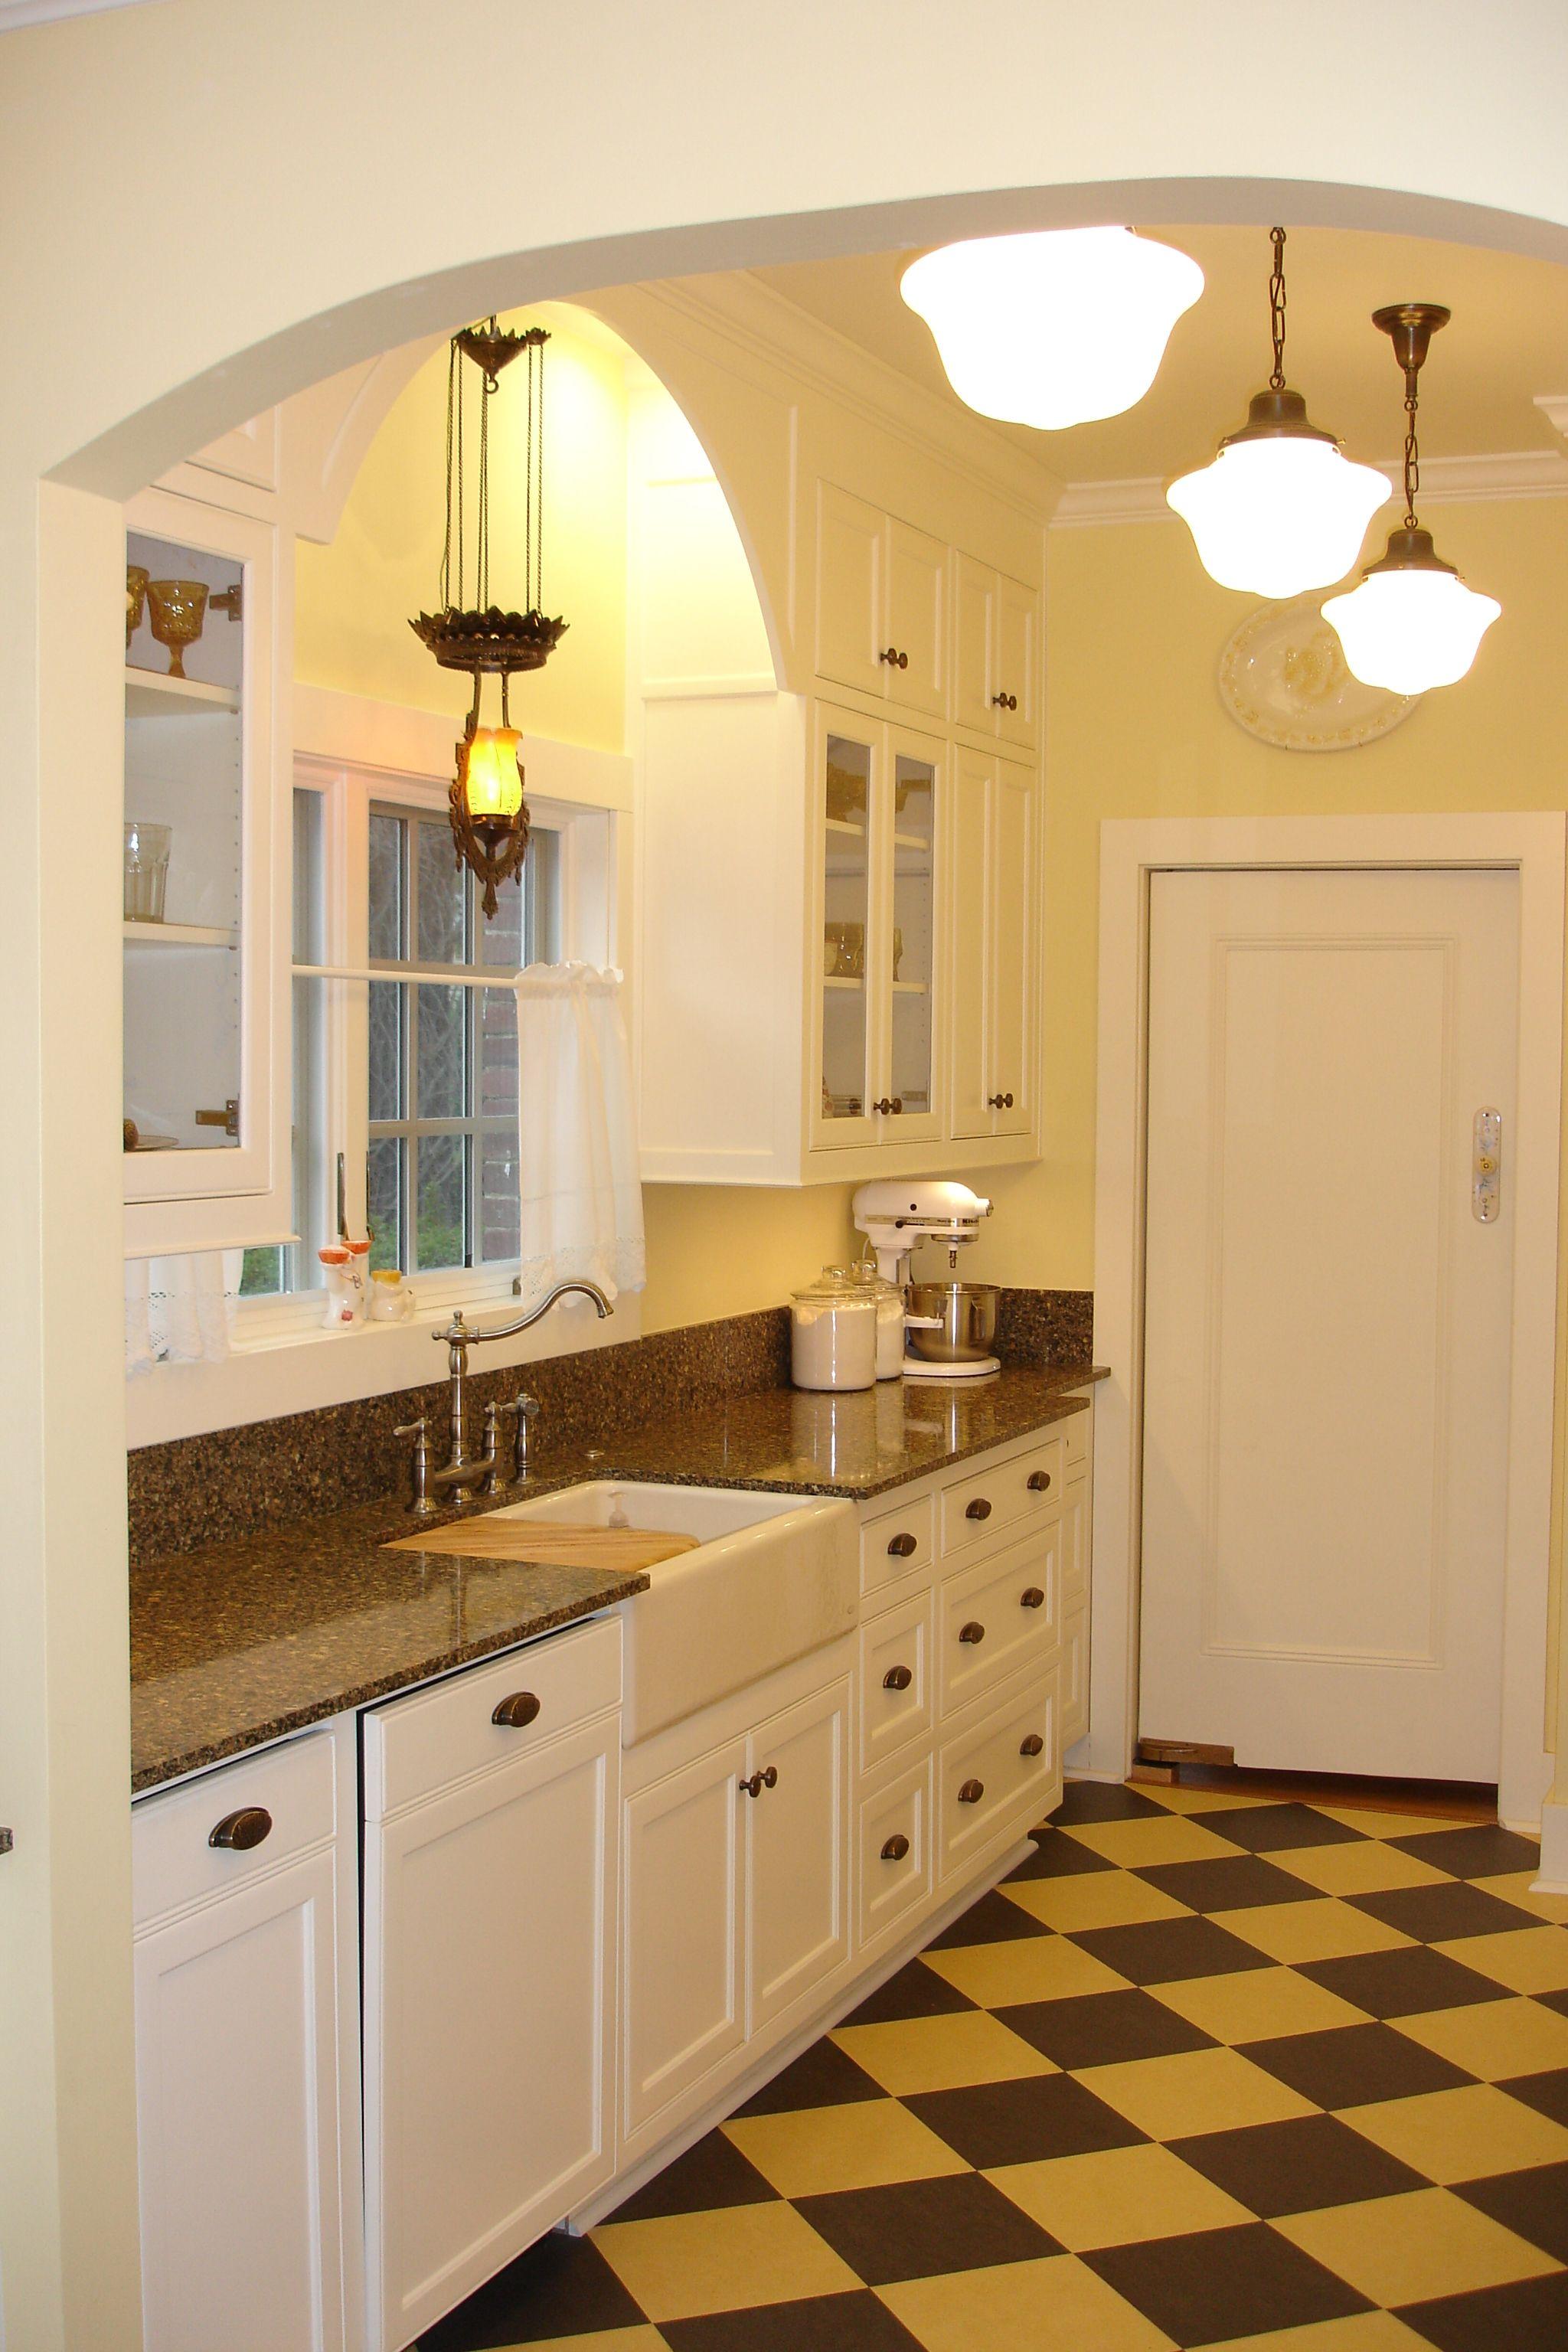 Kitchen Restoration Ideas colonial revival kitchen restoration | kitchens & dining spaces